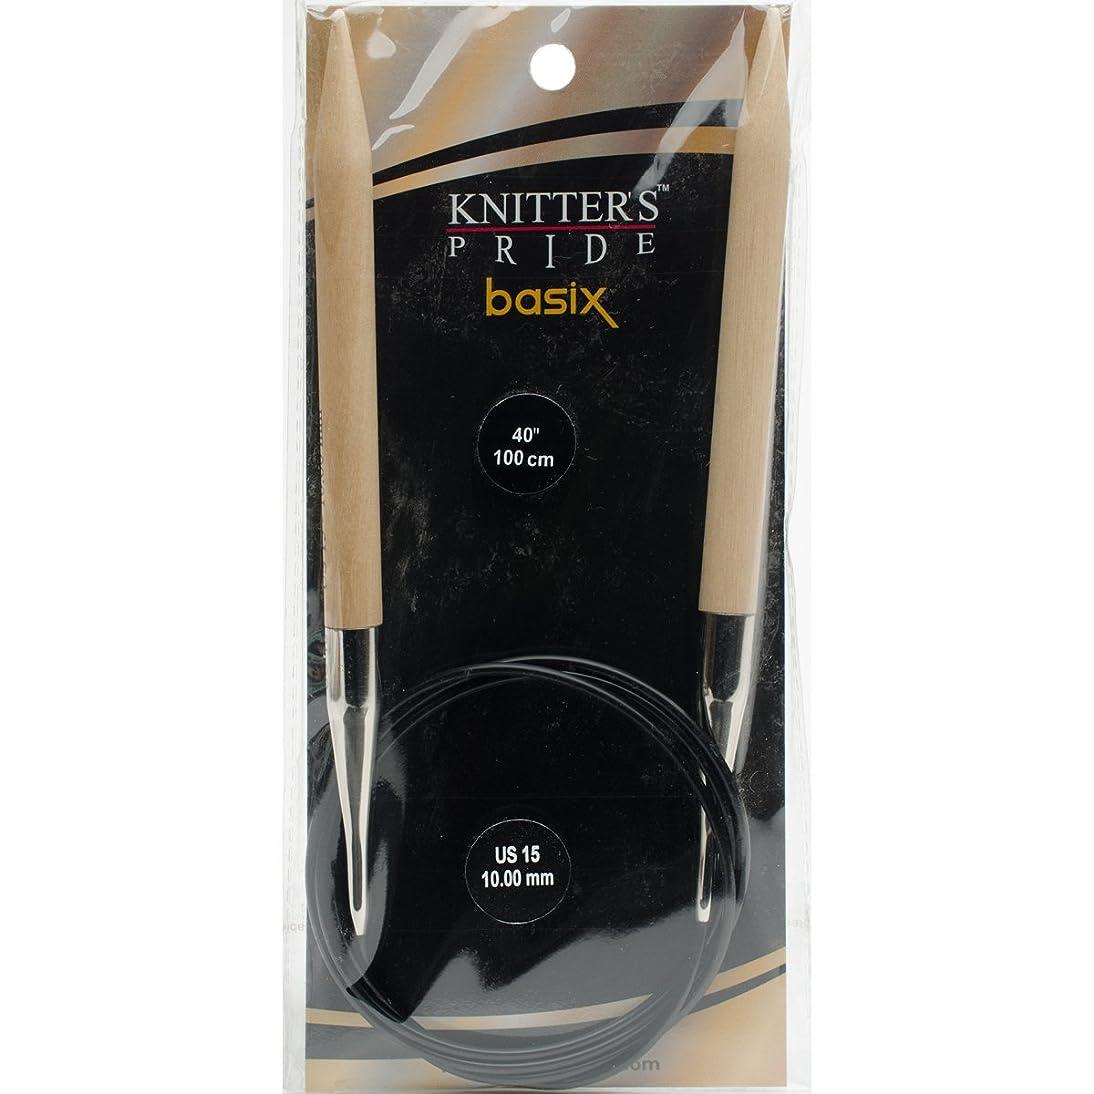 Knitter's Pride Basix Circular 40-inch (100cm) Knitting Needles; Size US 15 (10.0mm) 400242